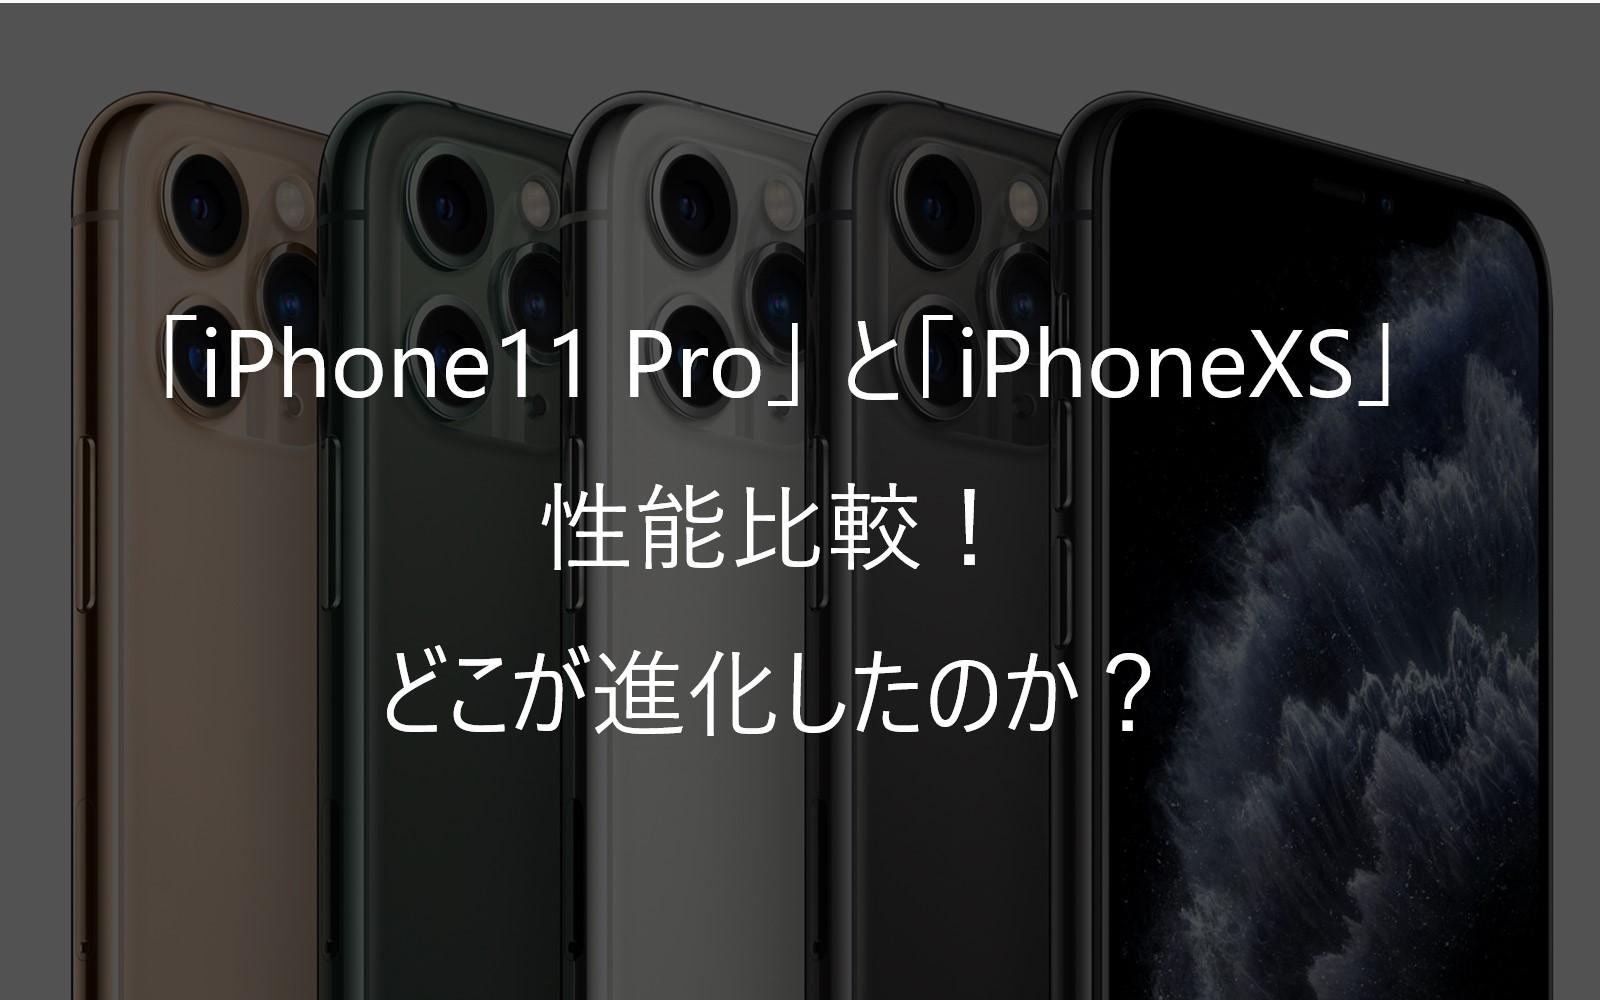 iPhone11 ProとiPhoneXSの性能比較!オススメはどっちか解説